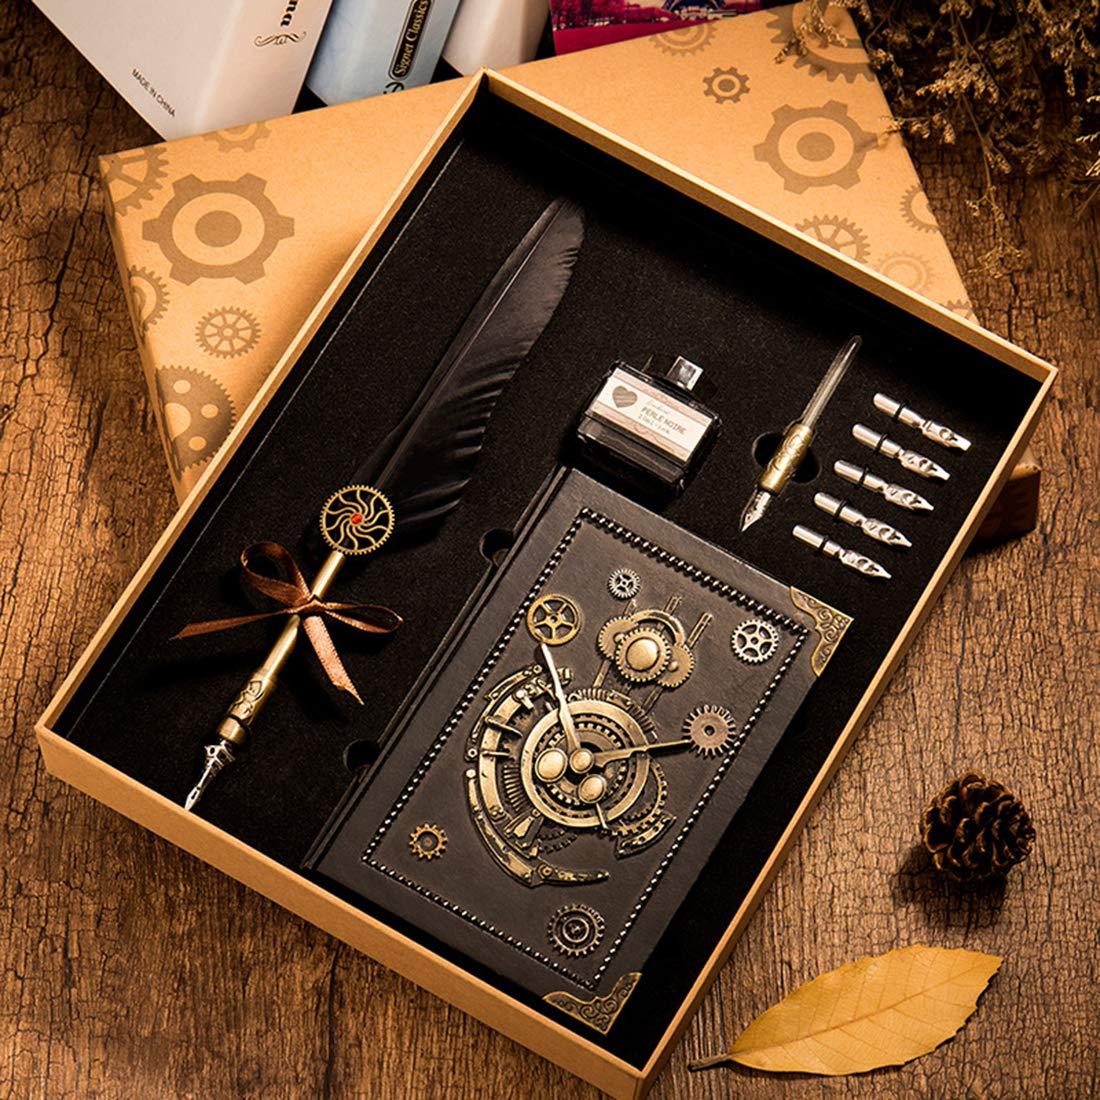 HENHEN Feather Quill Pen Set - 100% Hand Craft - Steampunk Quill Pen and Notebook Set, in Gift Box by HENHEN (Image #7)